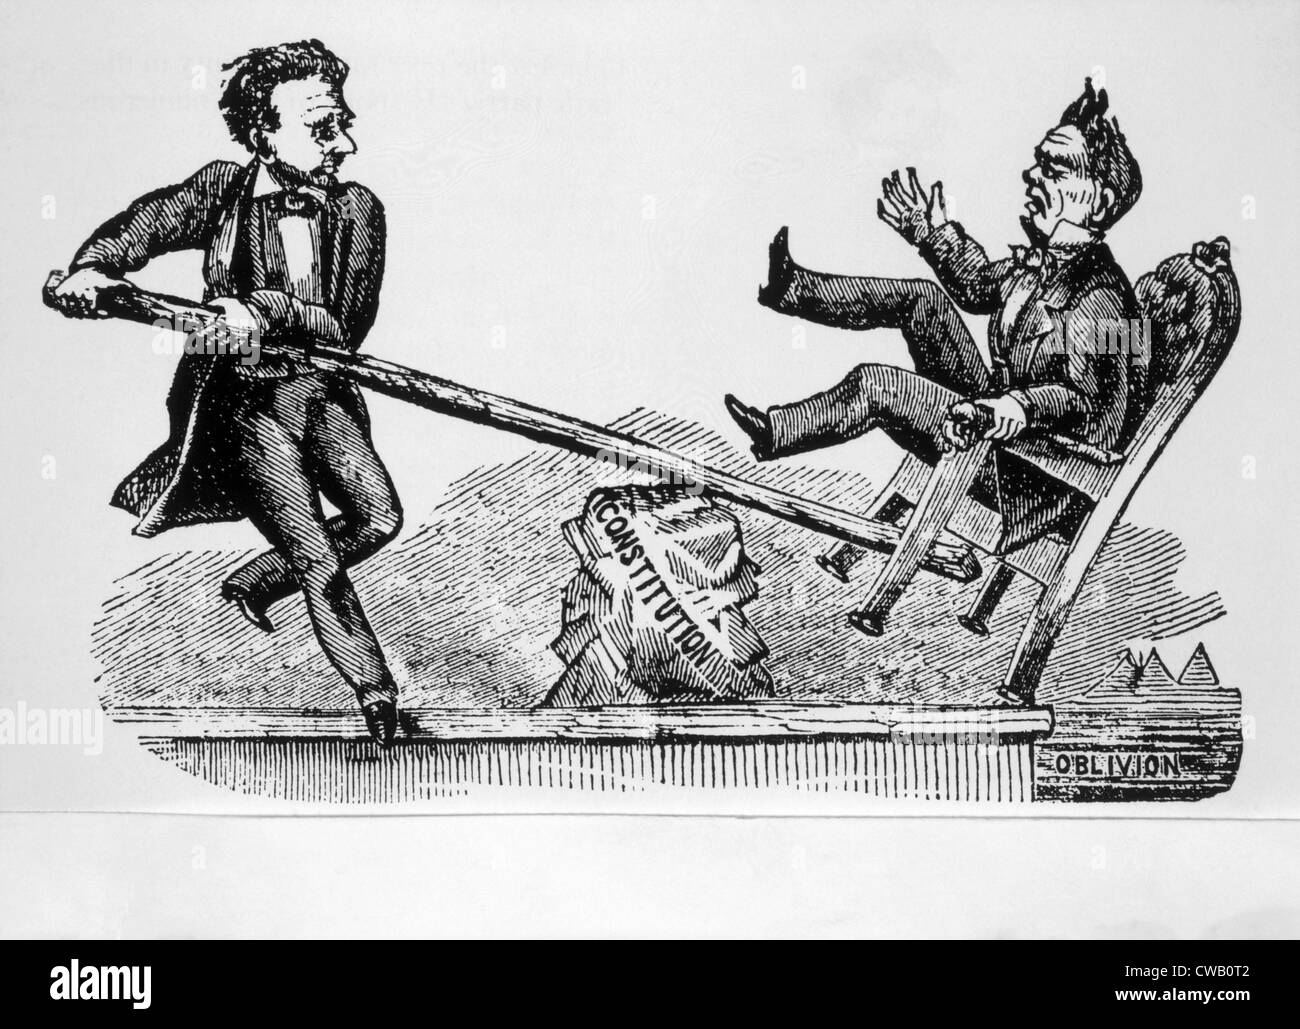 The Power Of The Rail Political Cartoon Depicting Rail Splitter